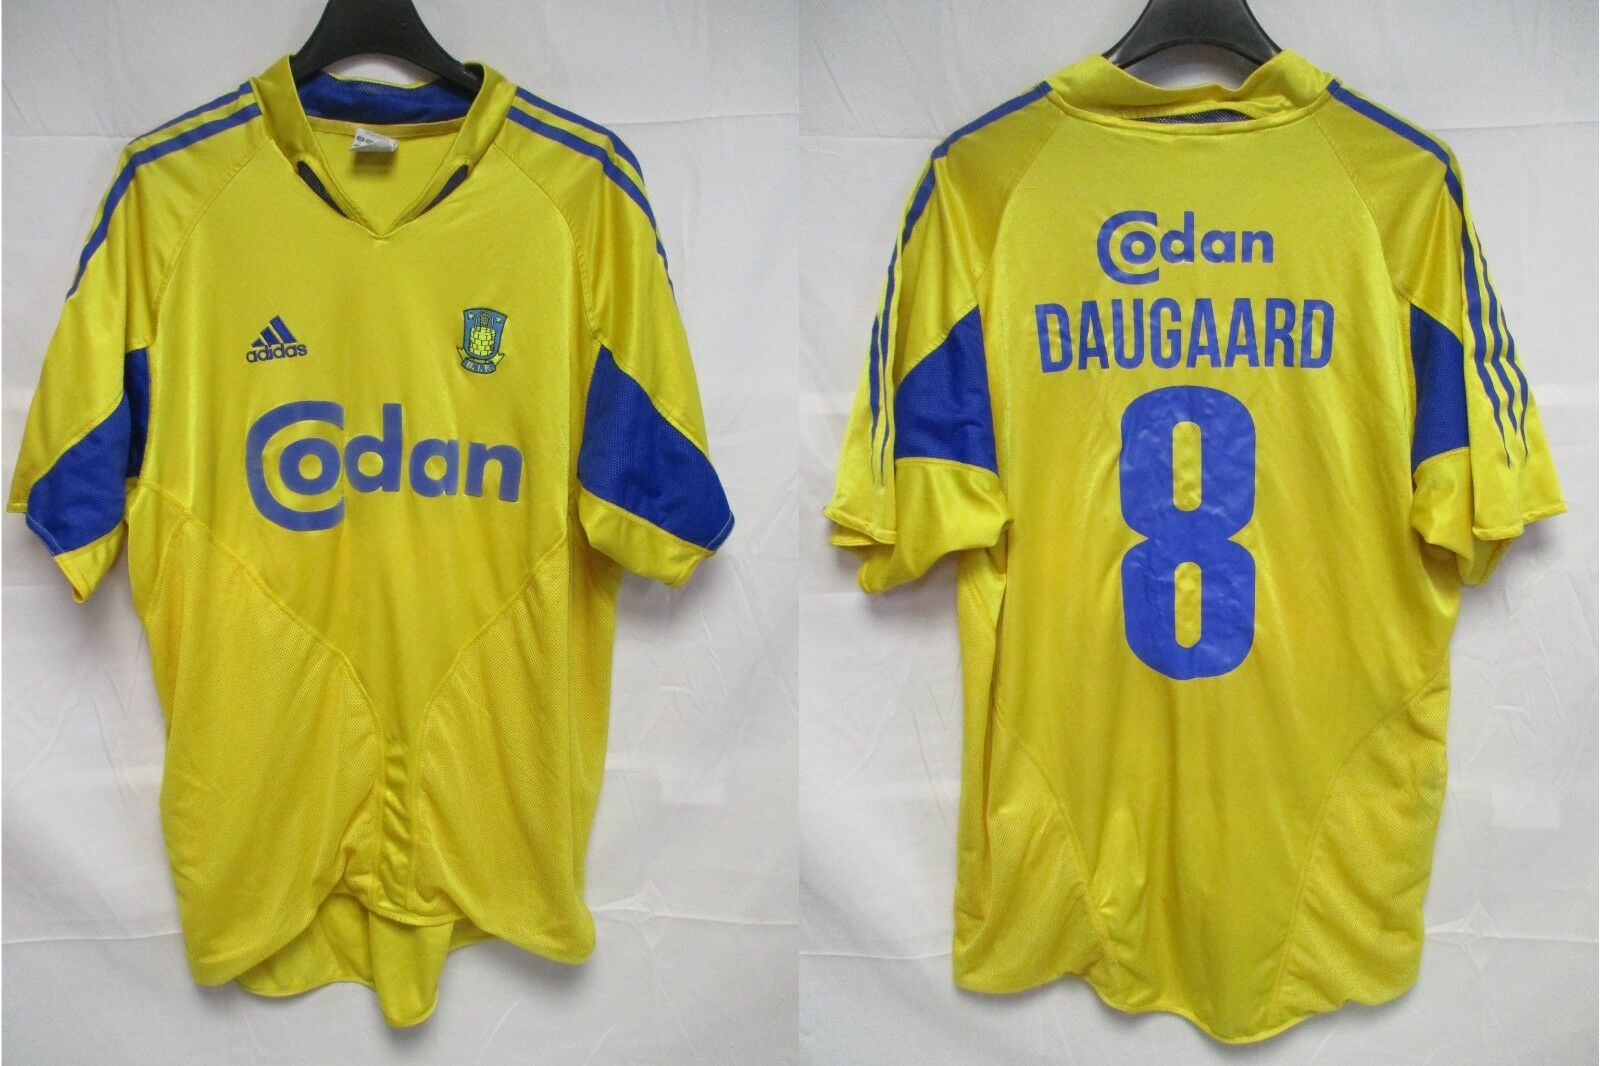 Maillot Brøndby B.I.F 2006 DAUGAARD n°8 ADIDAS vintage shirt trikot fodboldtrøje